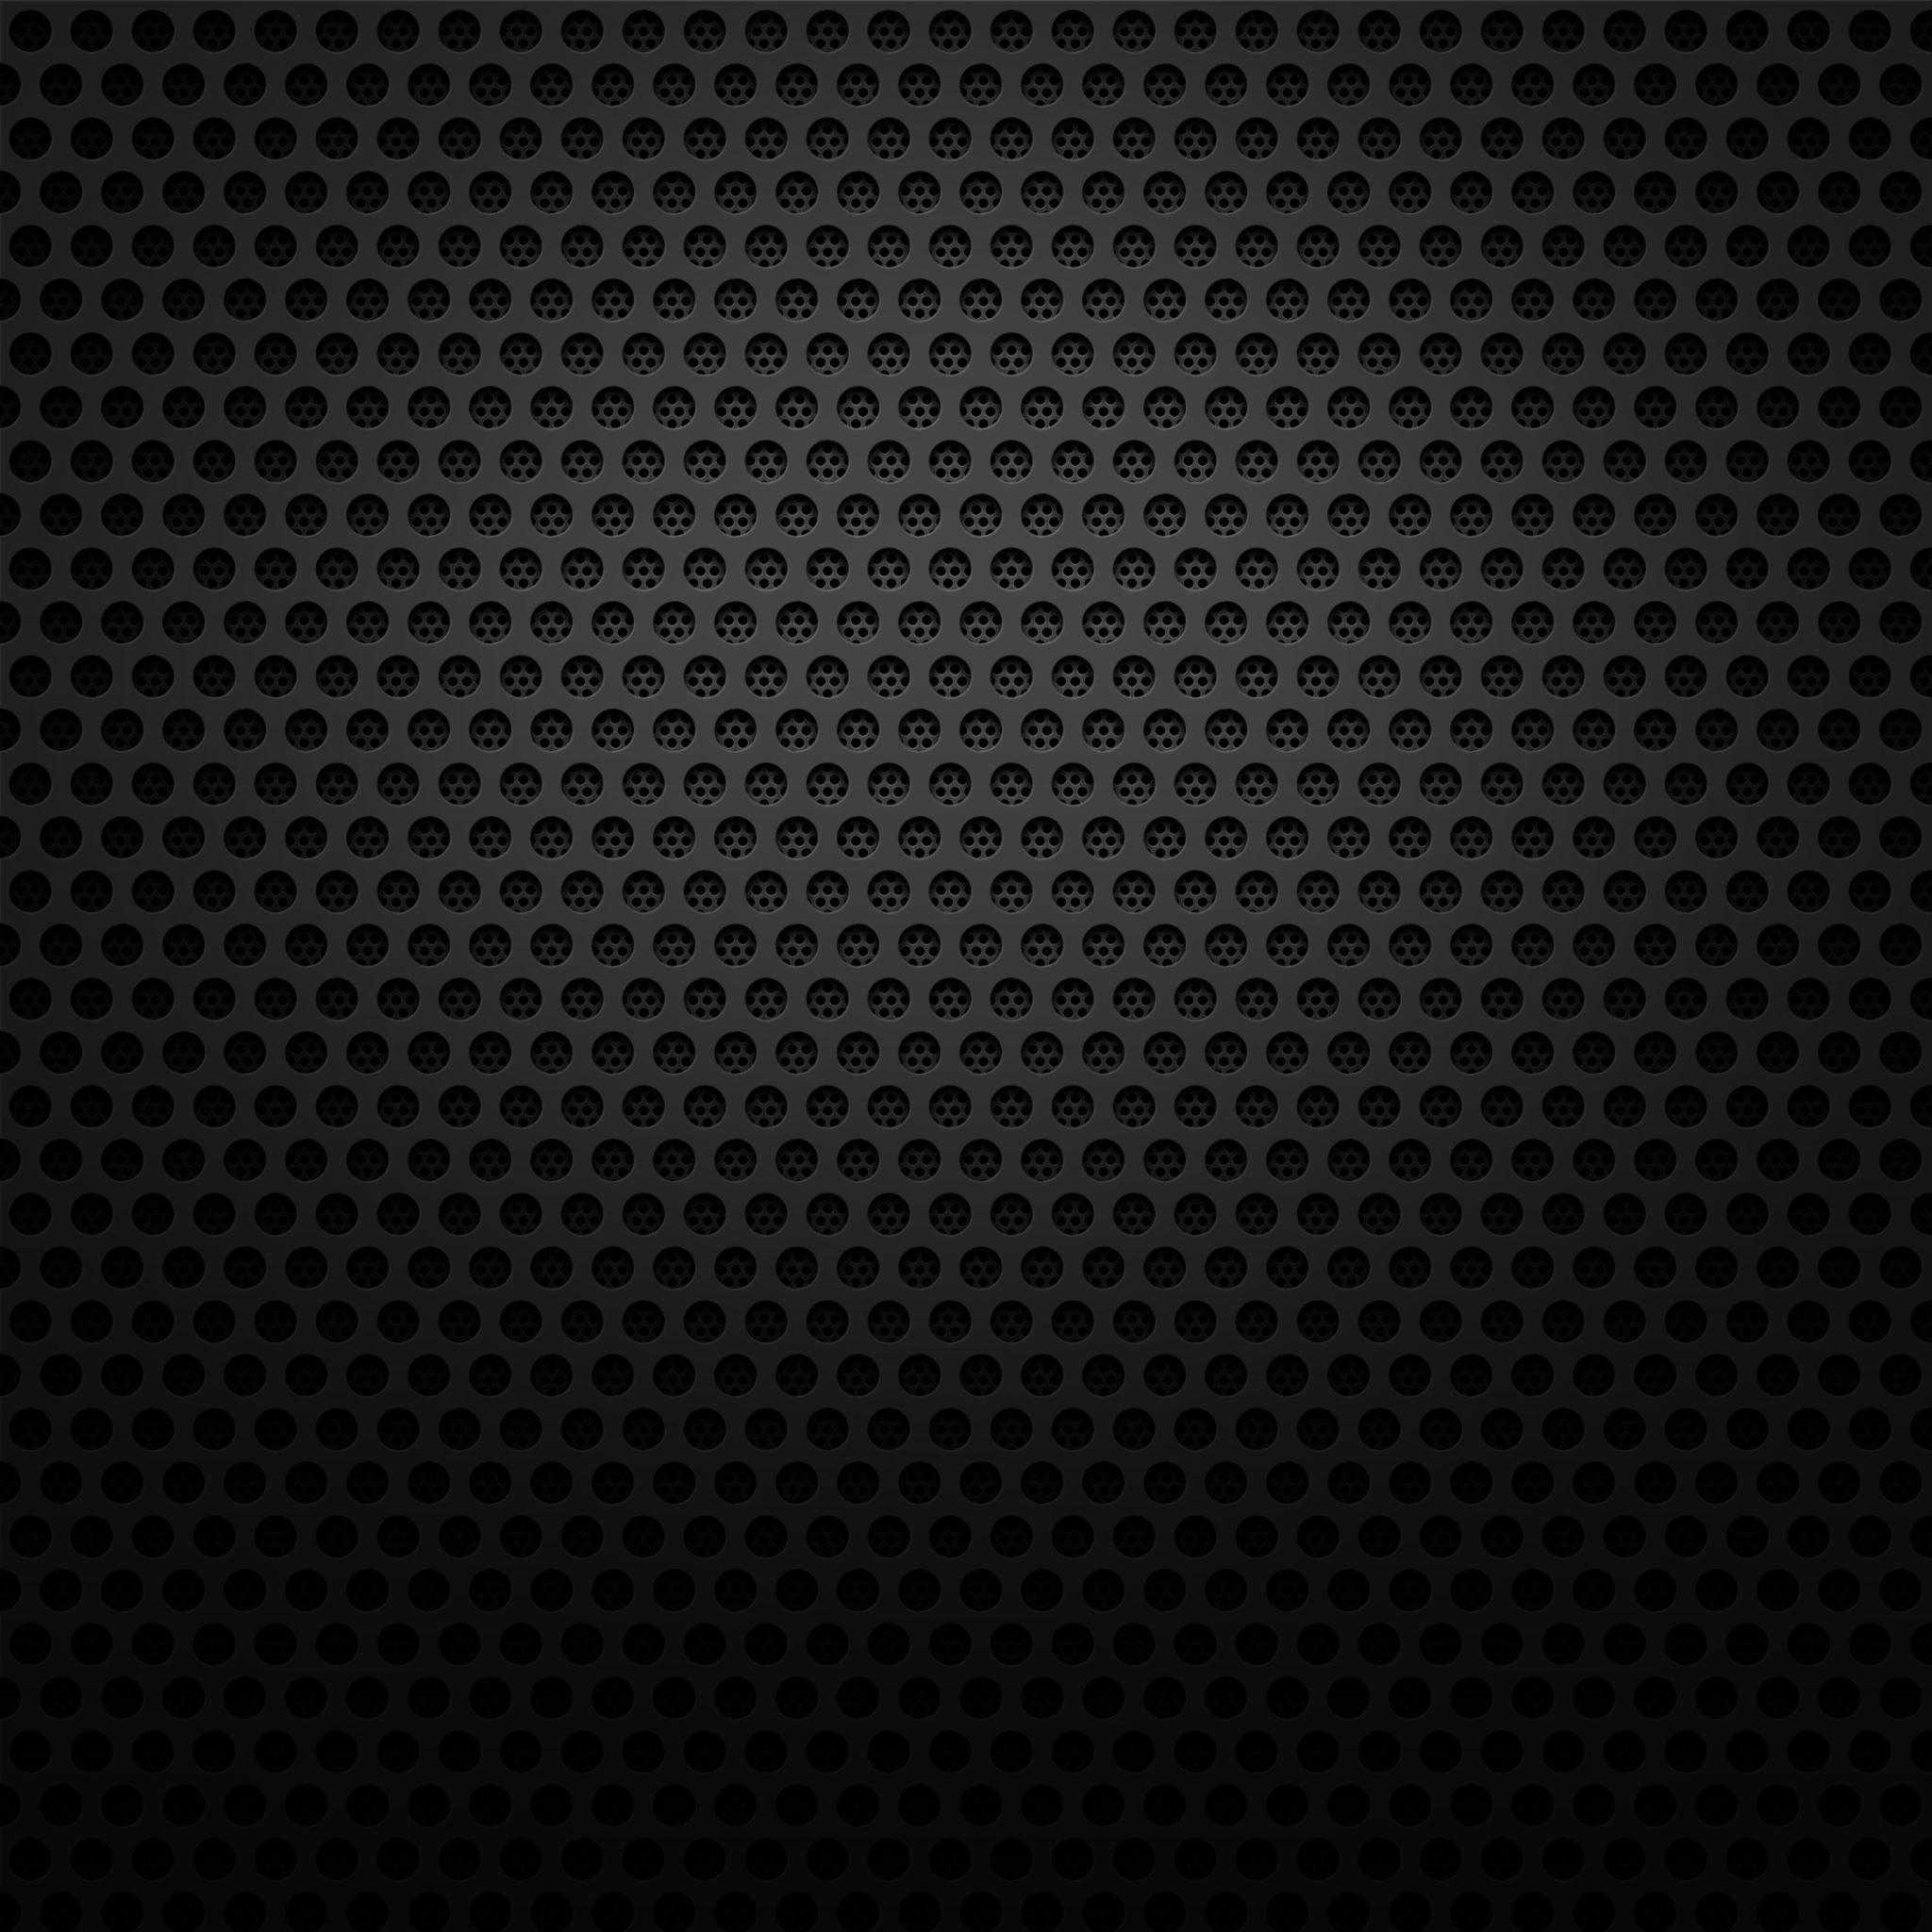 Black Hole iPad Air wallpaper